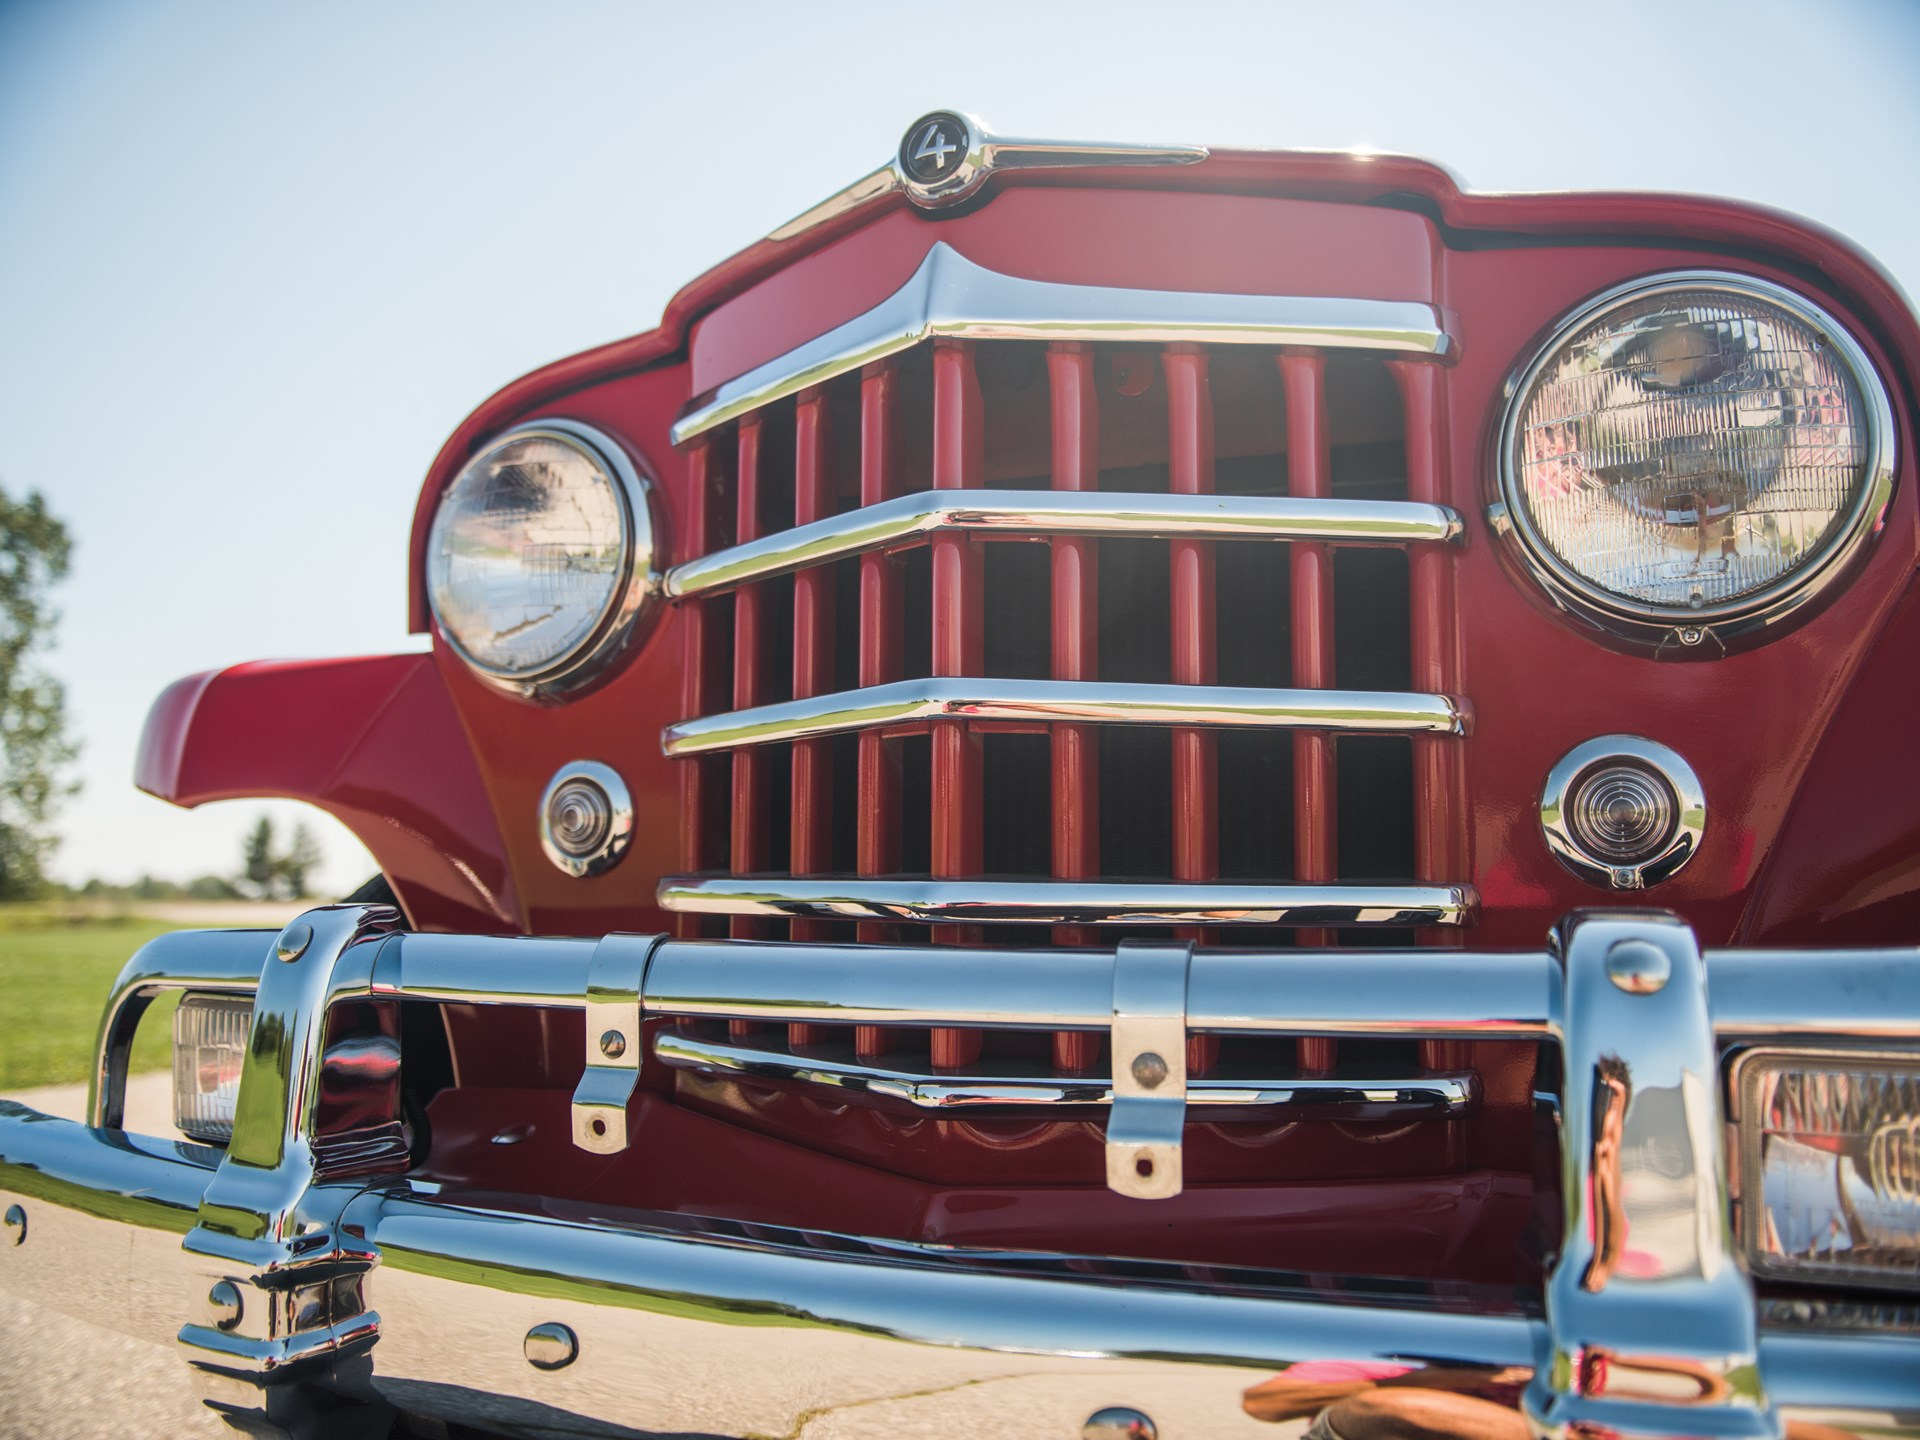 Rm Sothebys 1950 Willys Jeepster Phaeton Hershey 2016 Jeep Station Wagon